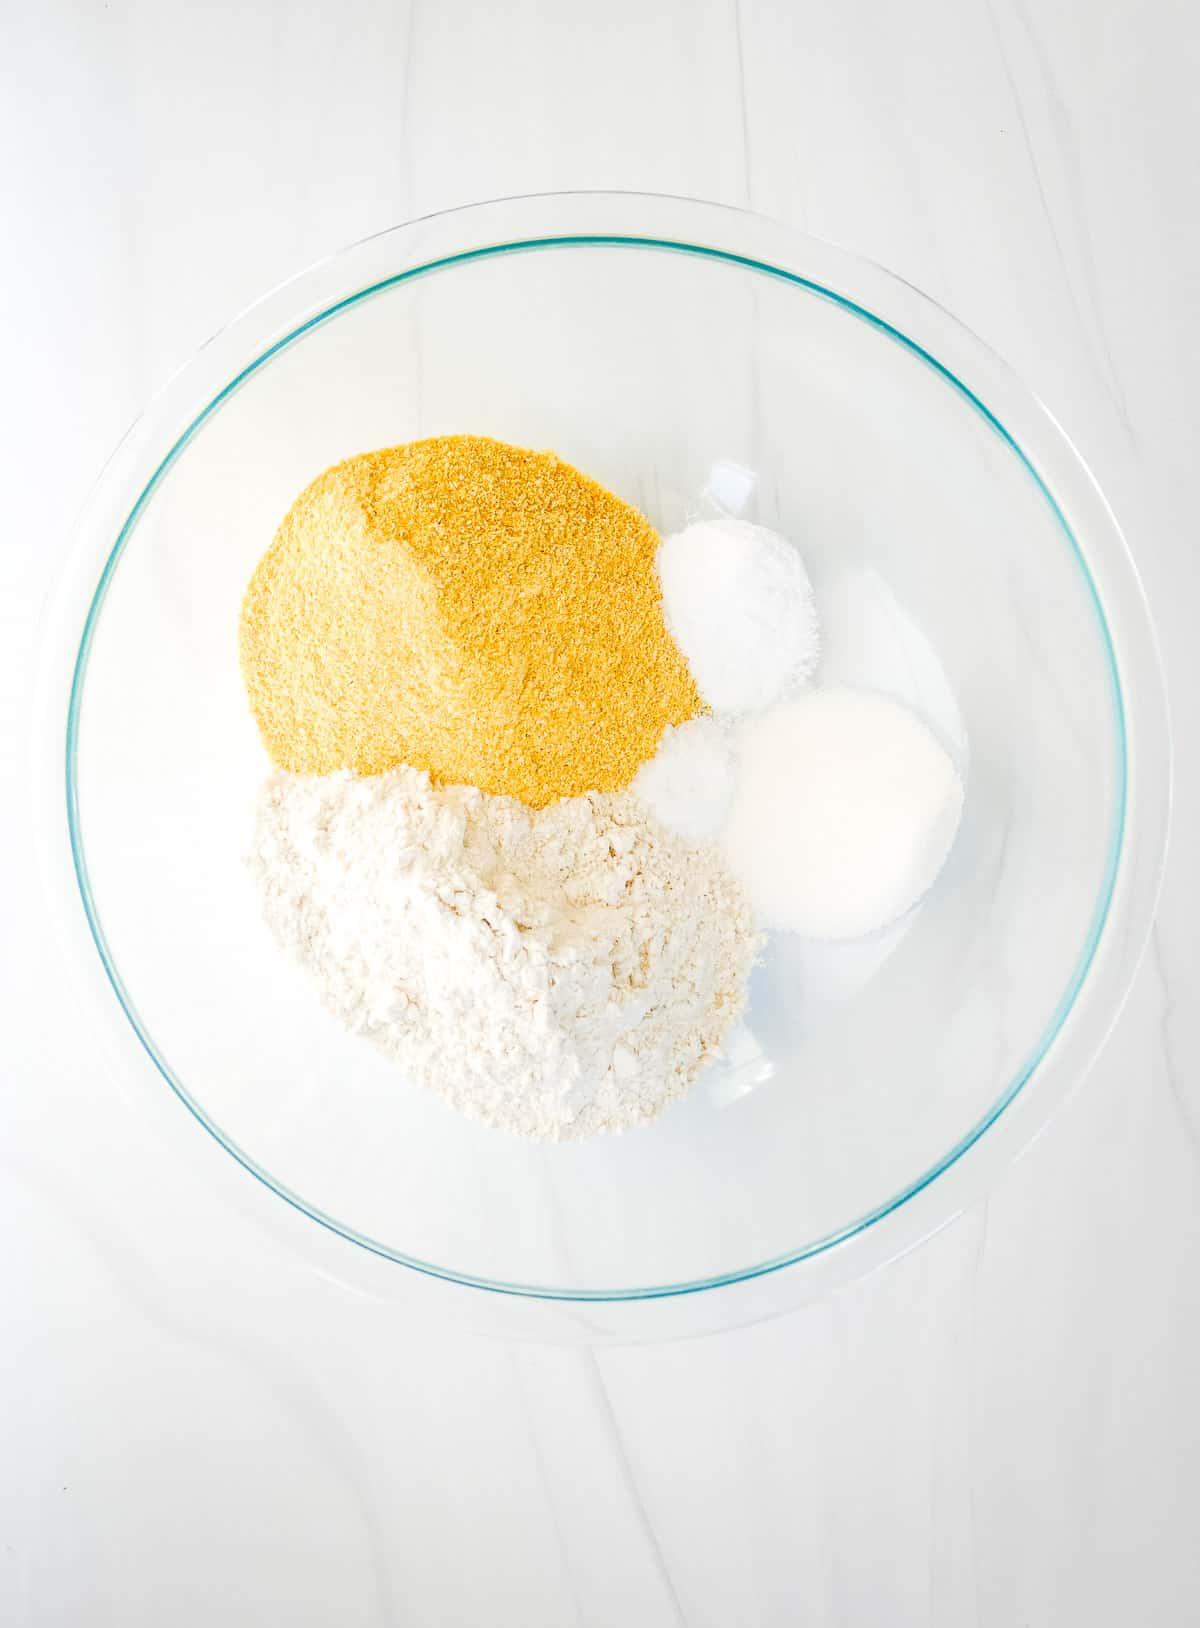 Cornmeal Pancakes dry ingredients in glass bowl